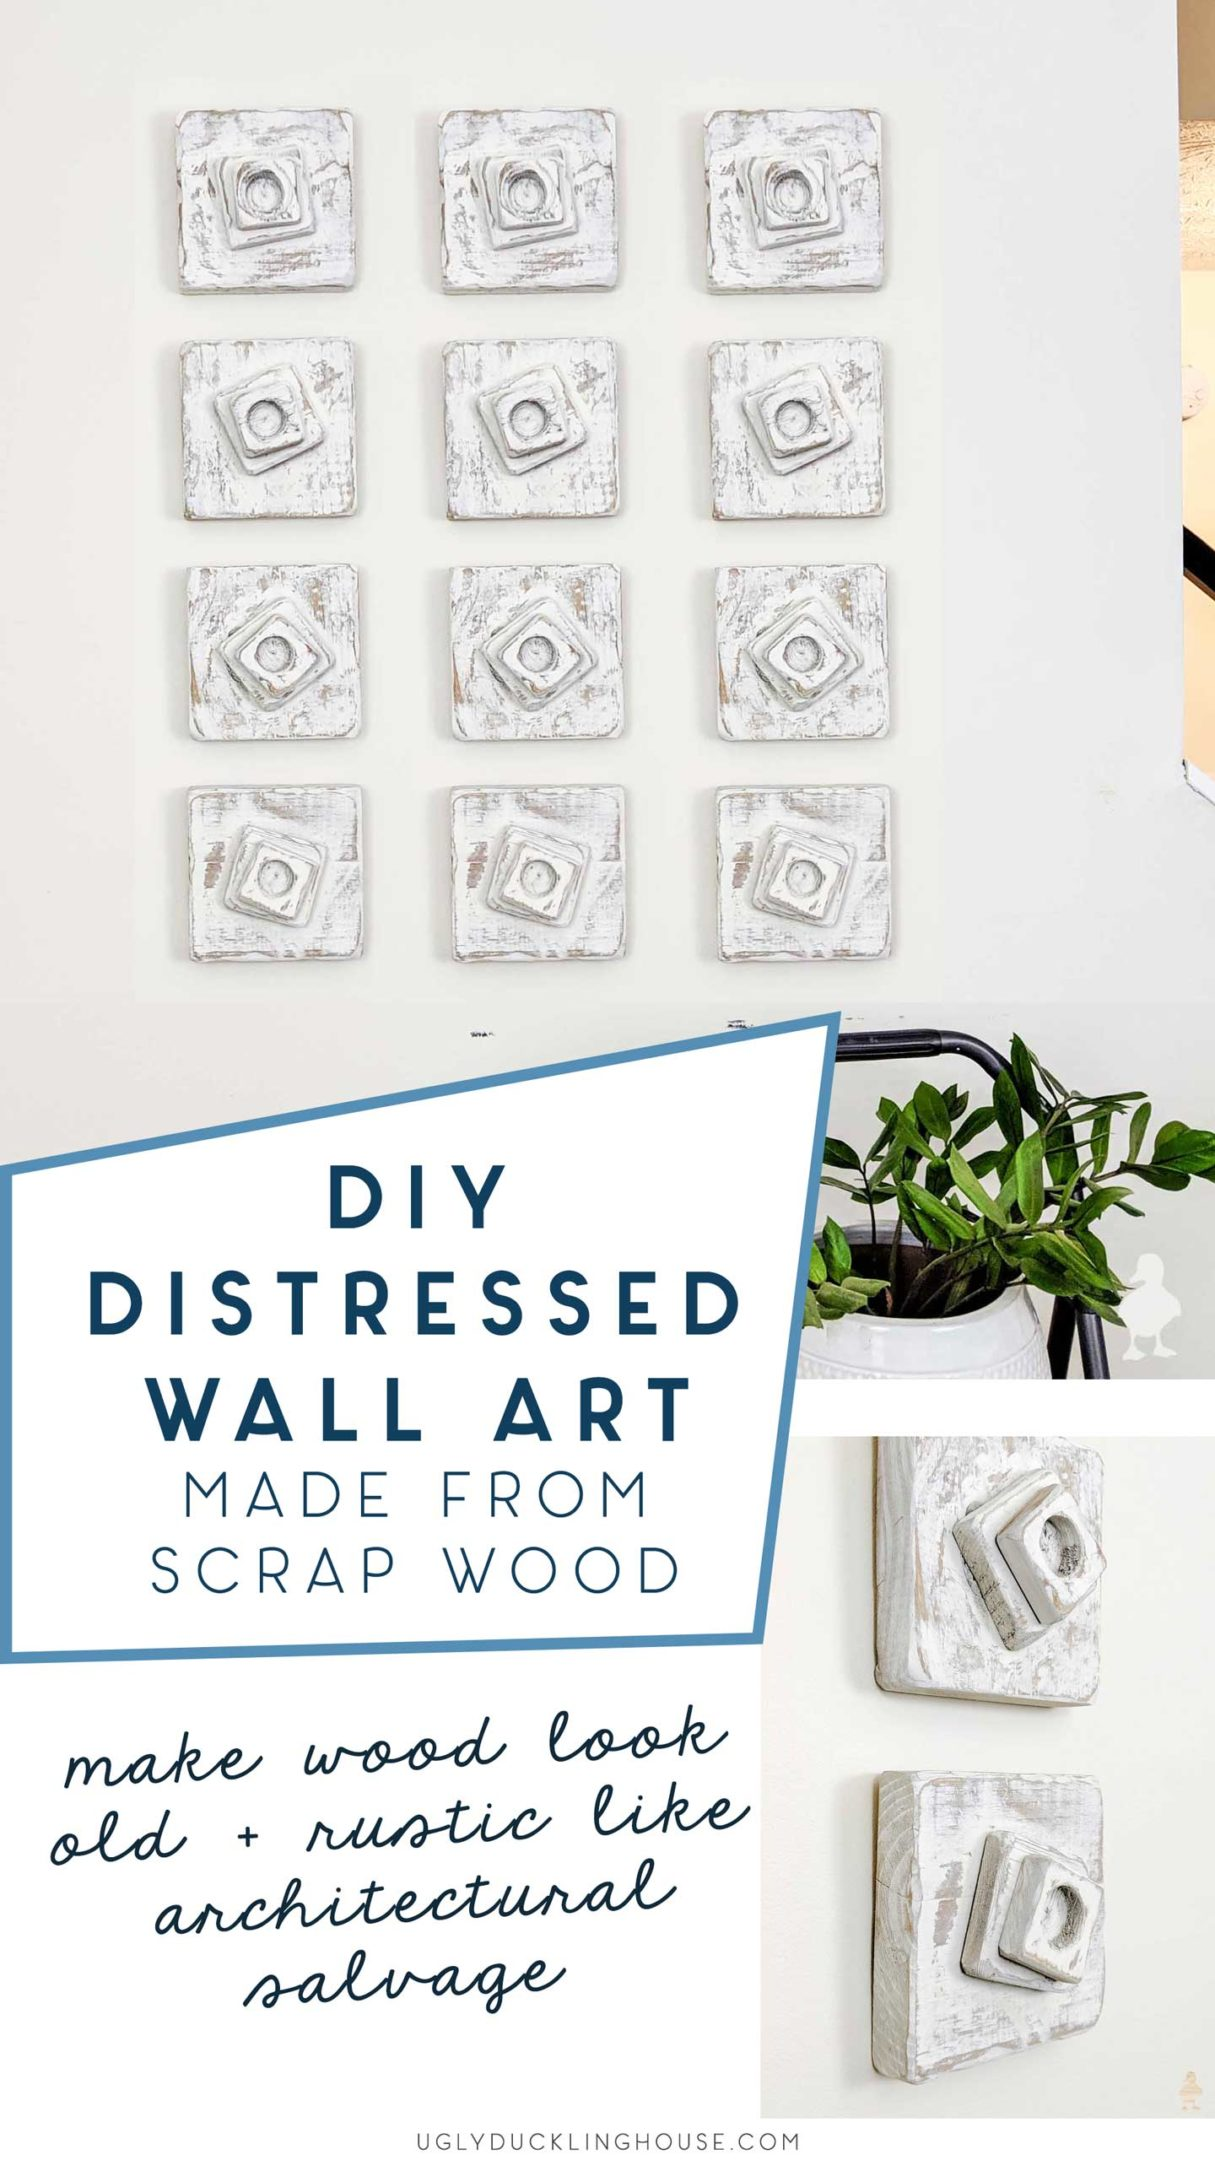 DIY distressed scrap wood wall art - make wood look like architectural scrap wood